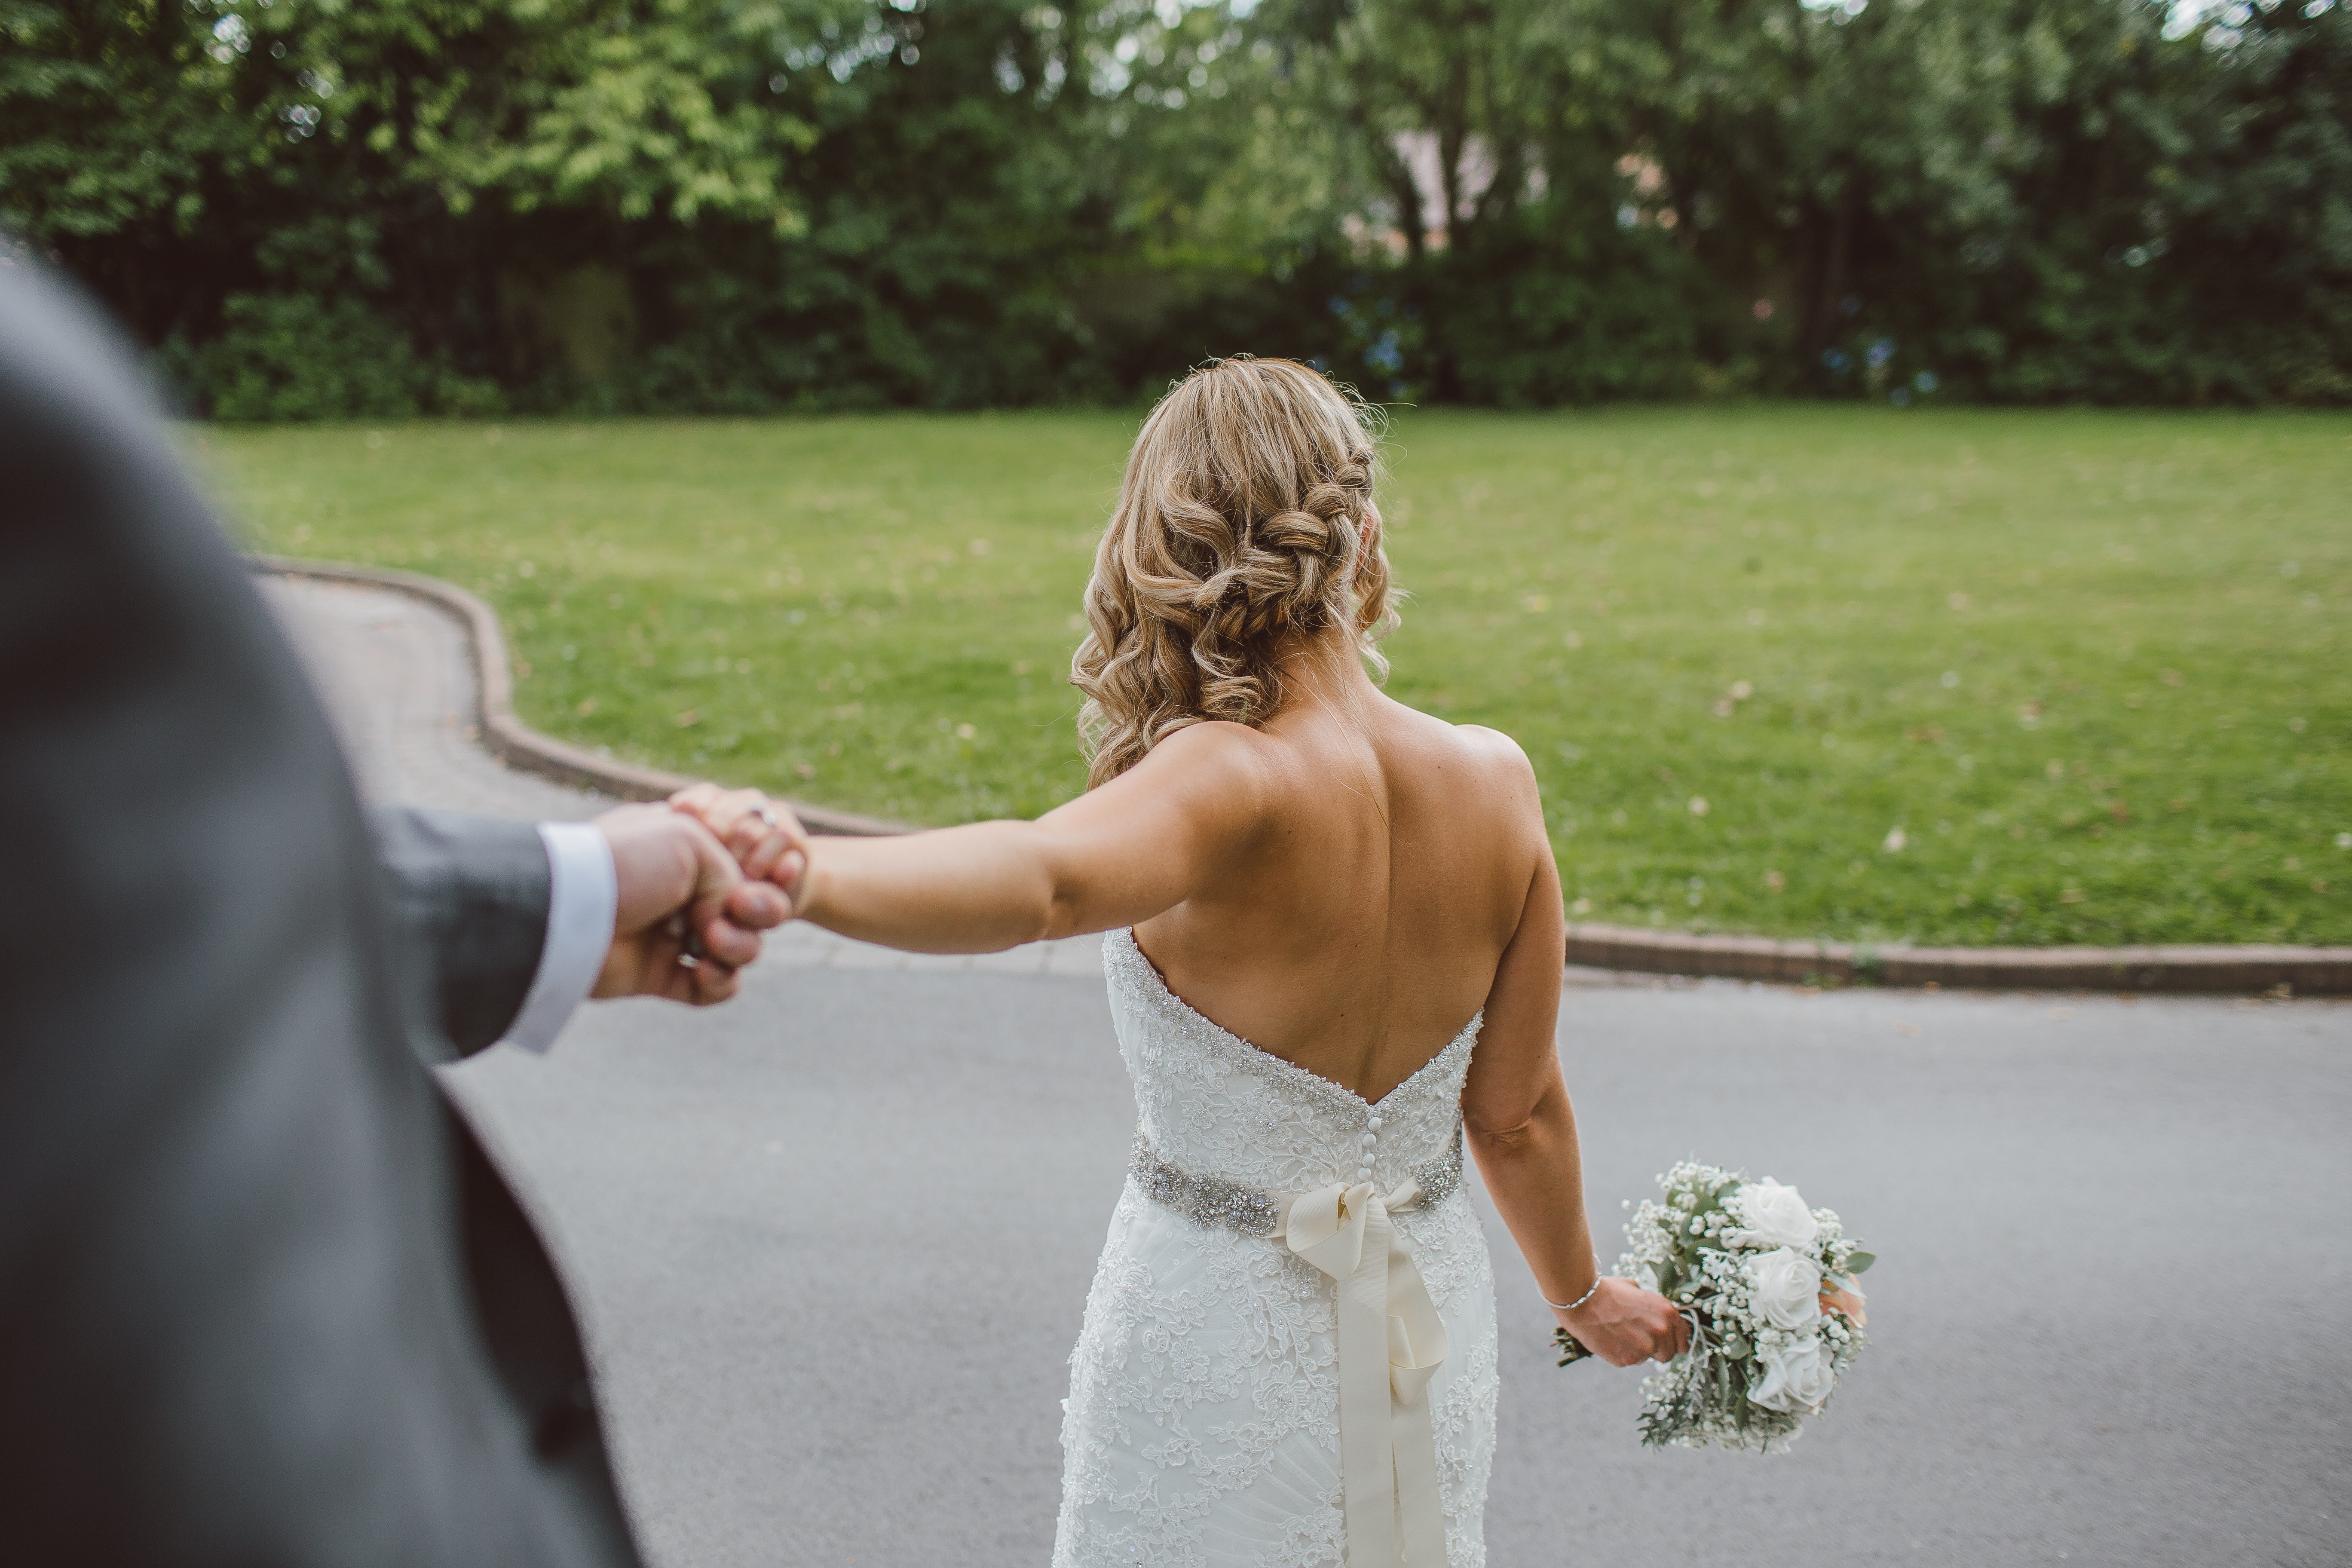 Tendencias | Peinados para bodas l Yatepeino.com